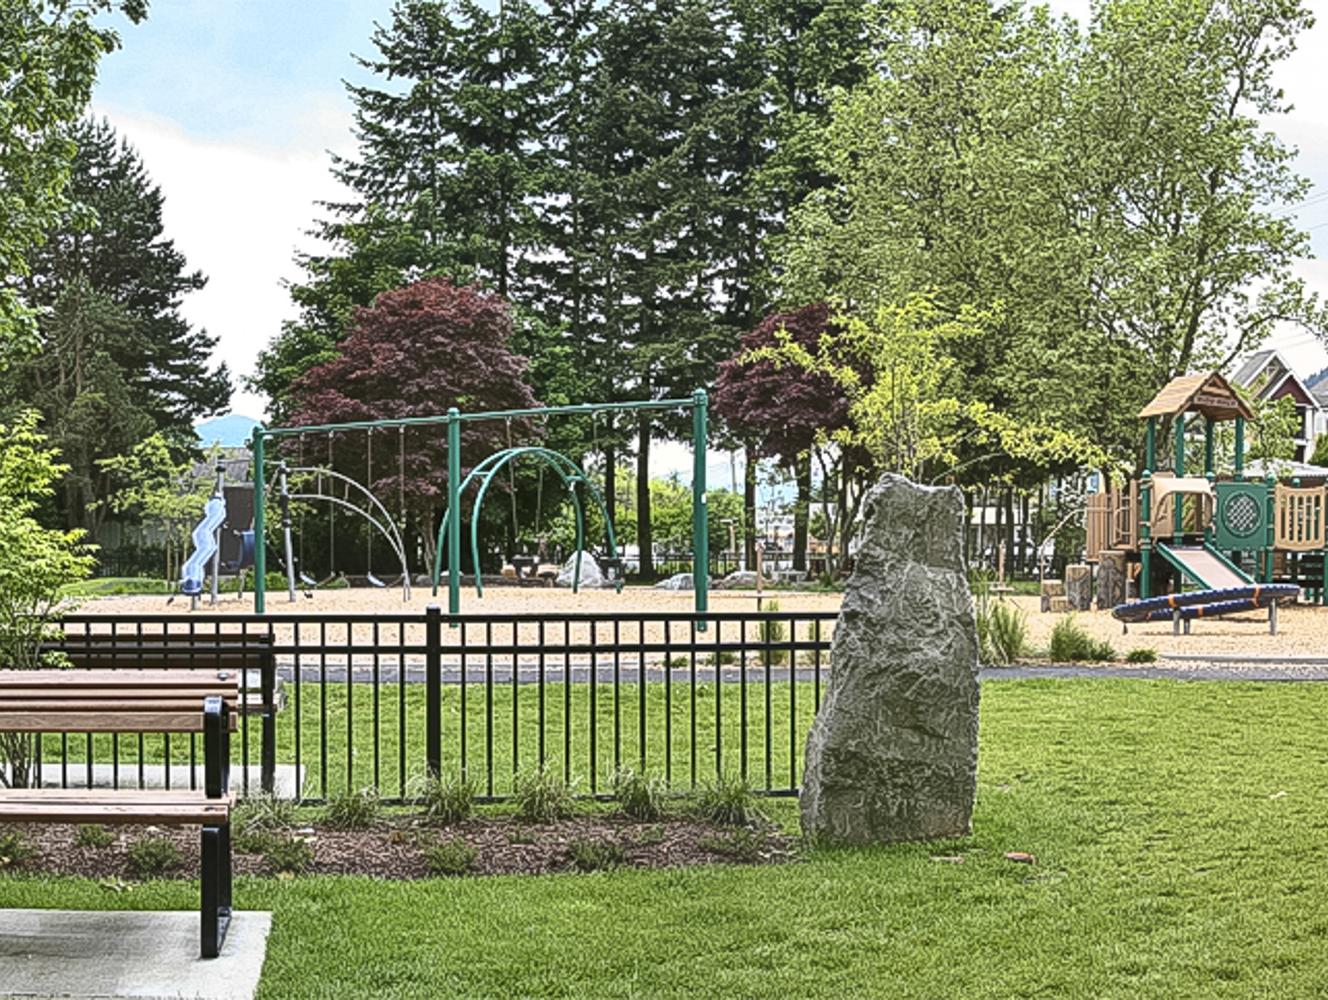 Stan Clarke Park